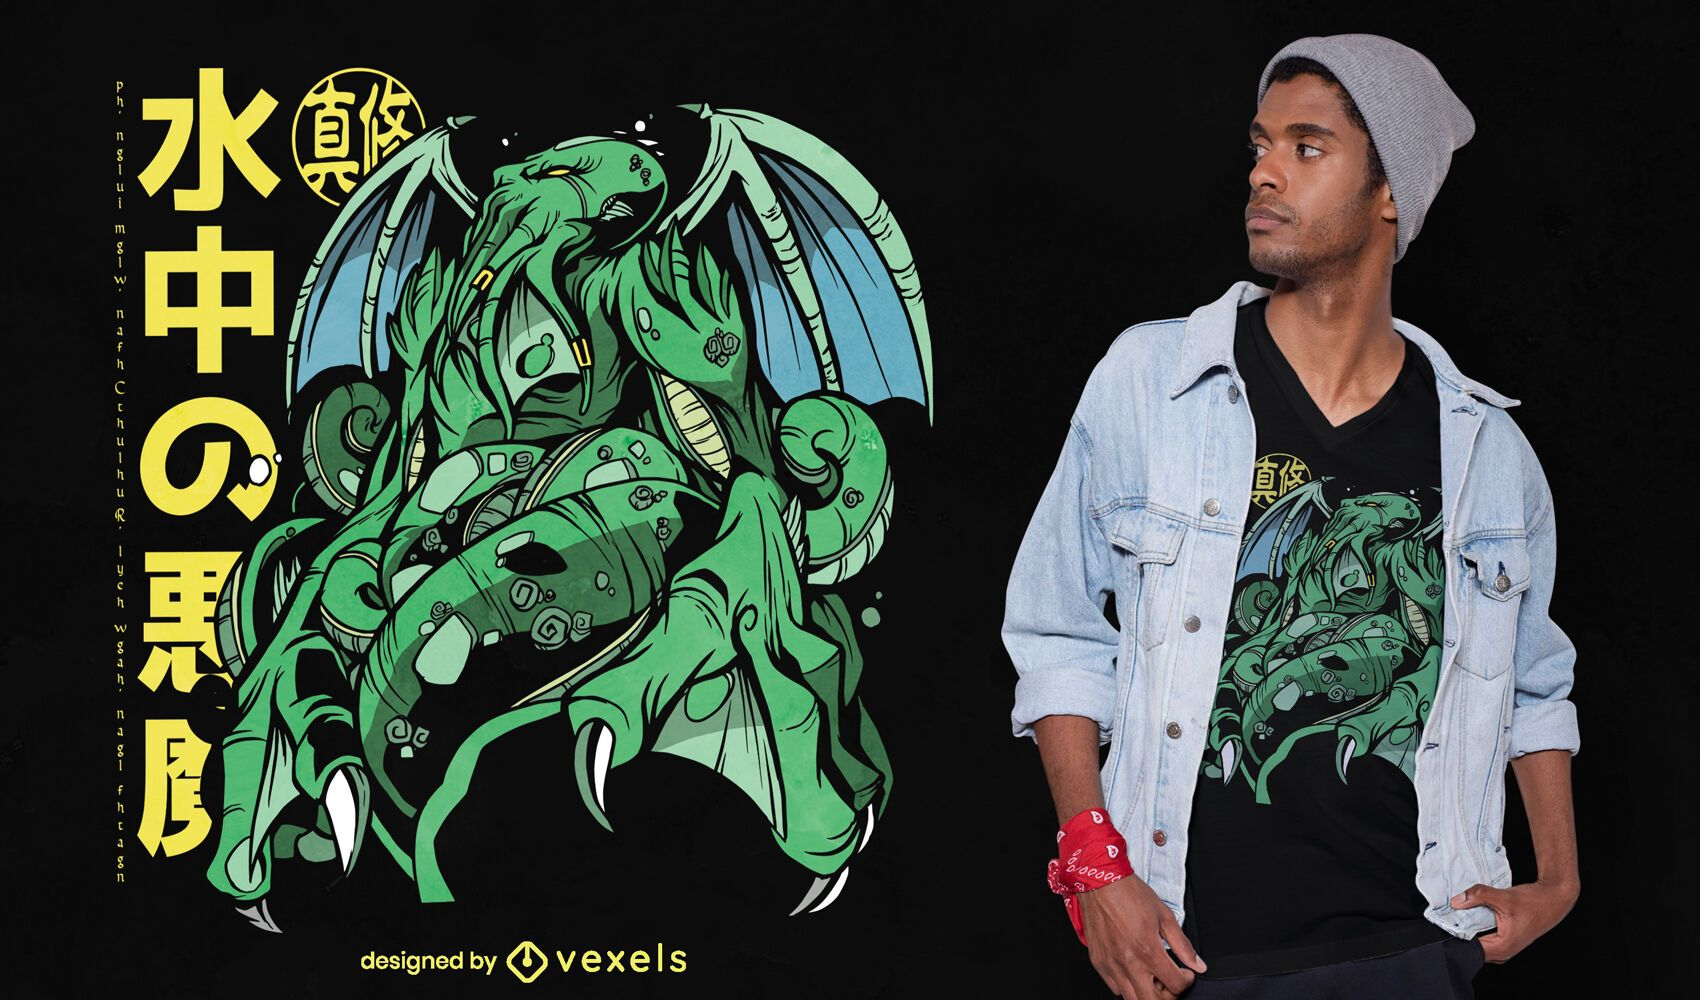 Cthulhu anime t-shirt design